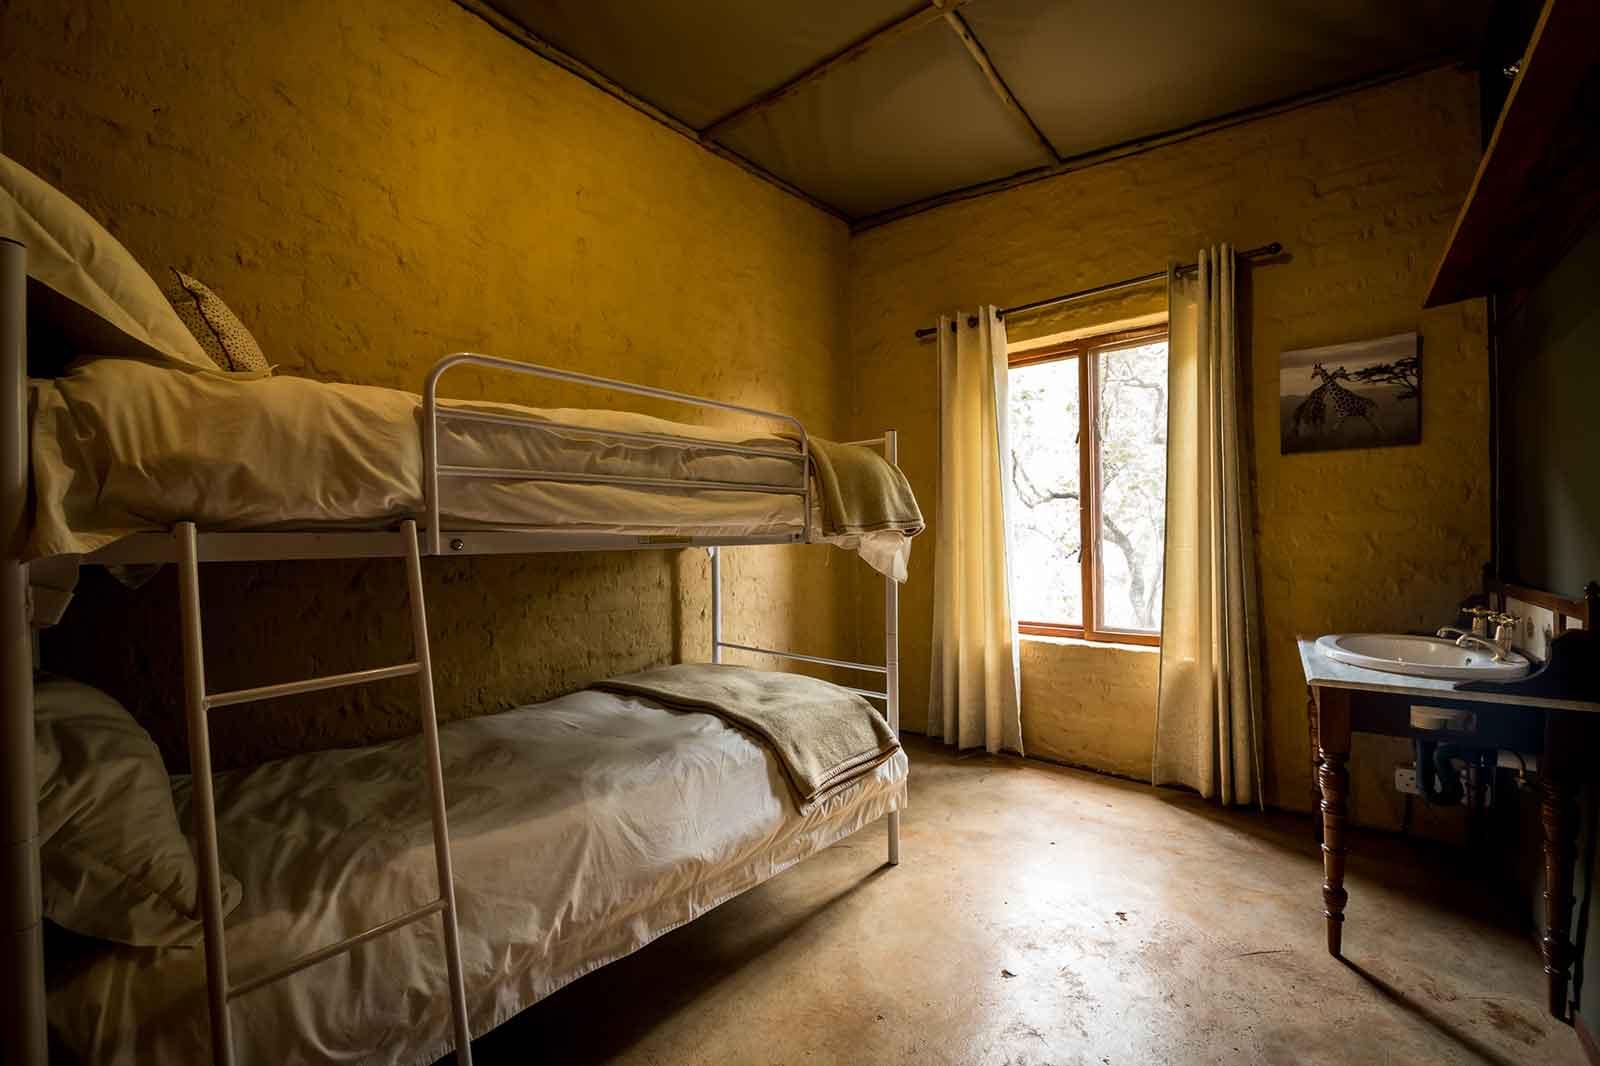 1c-bunk-beds